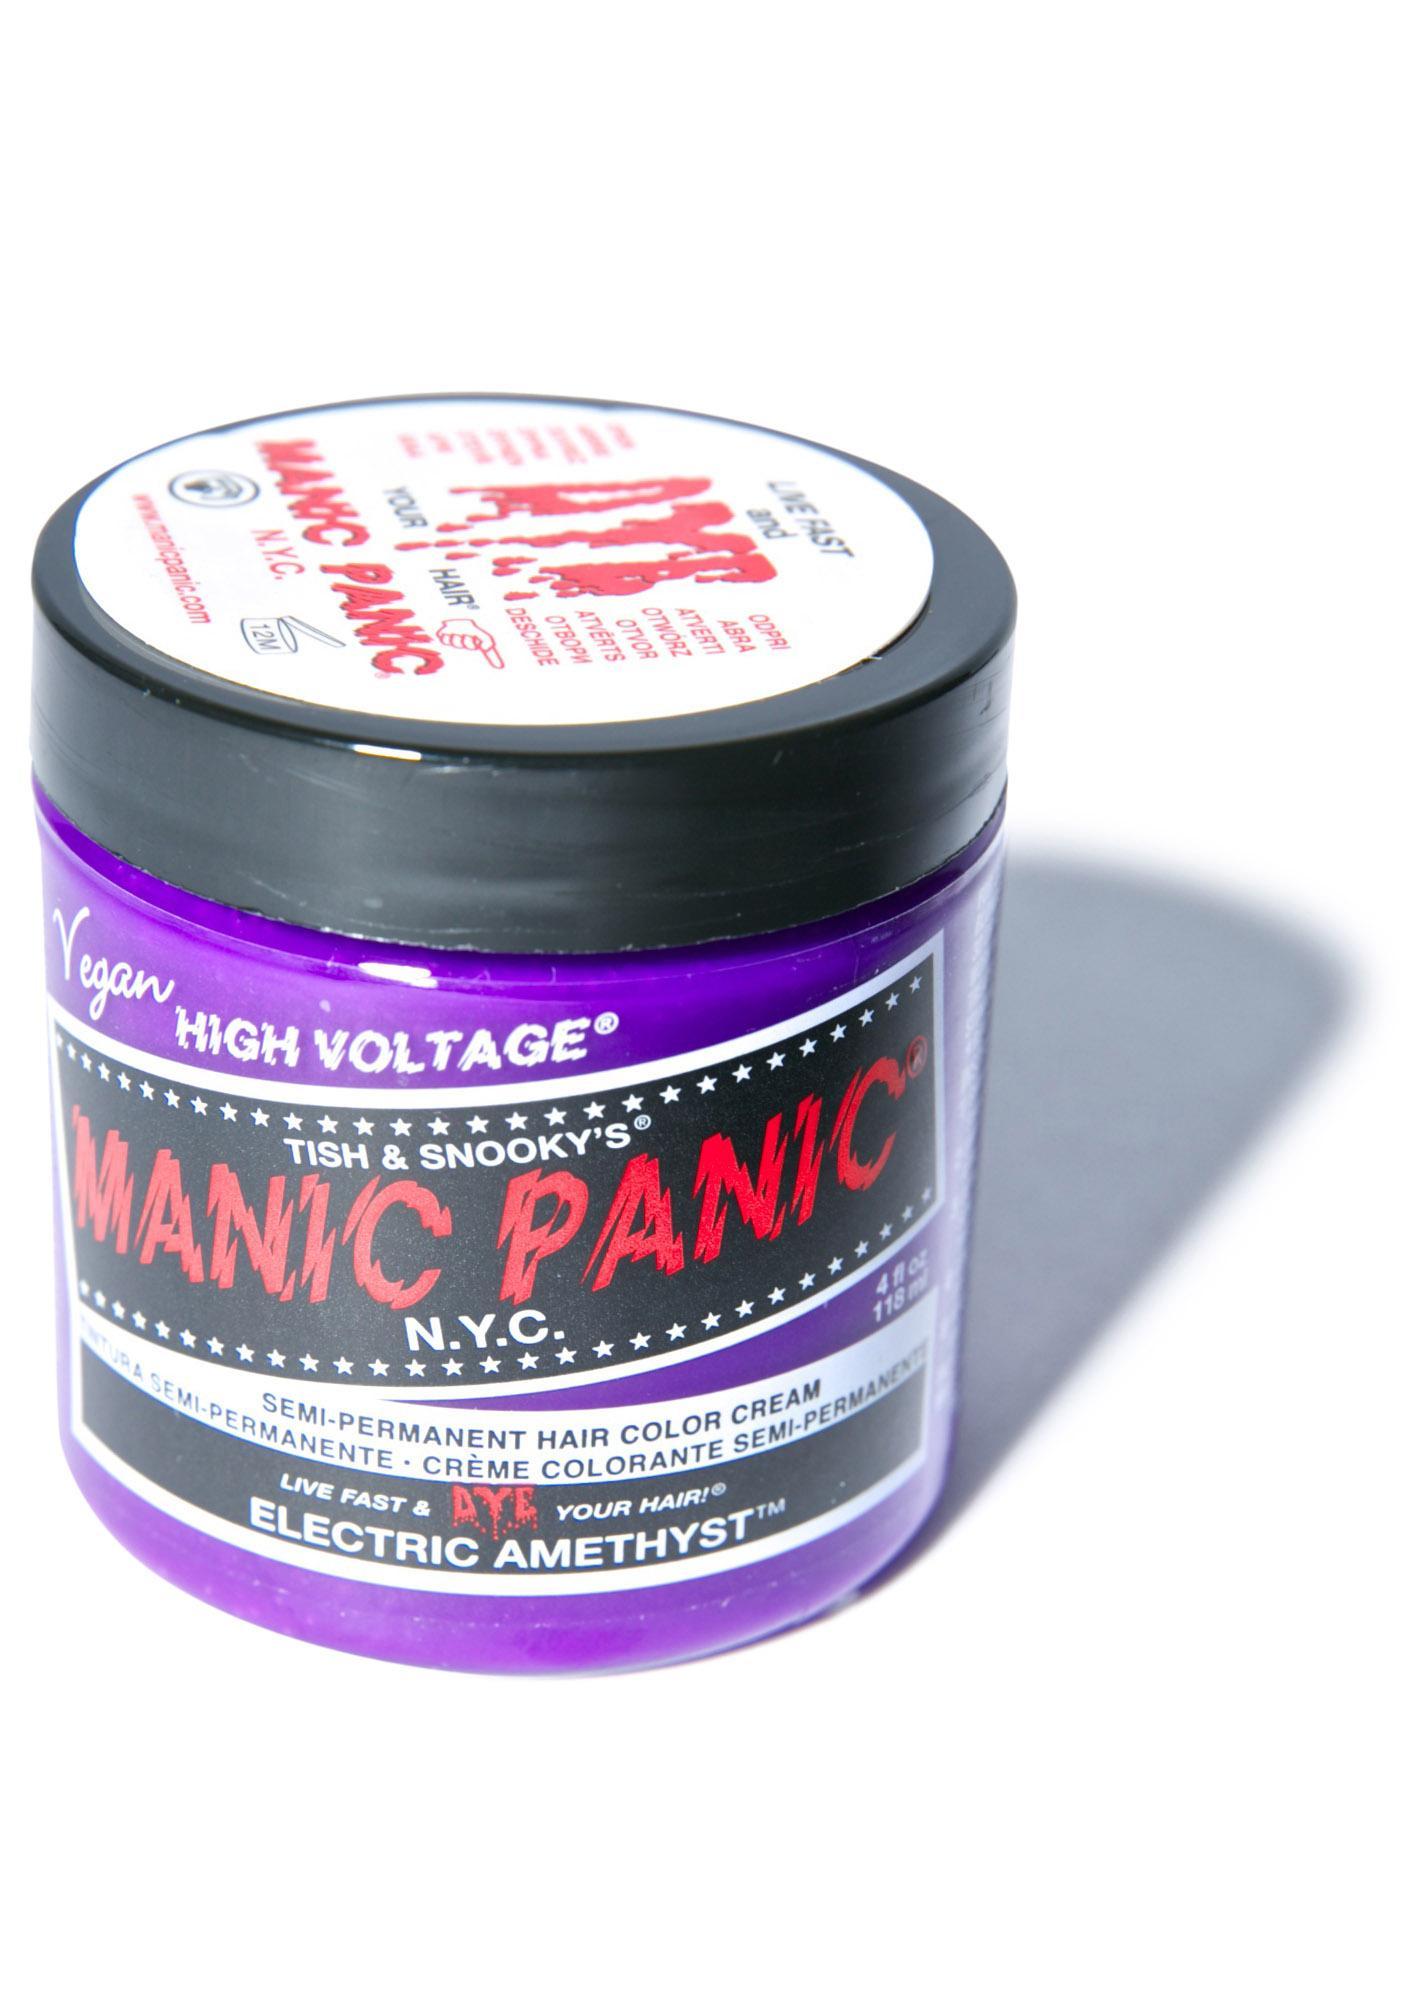 electric amethyst manic panic - photo #32